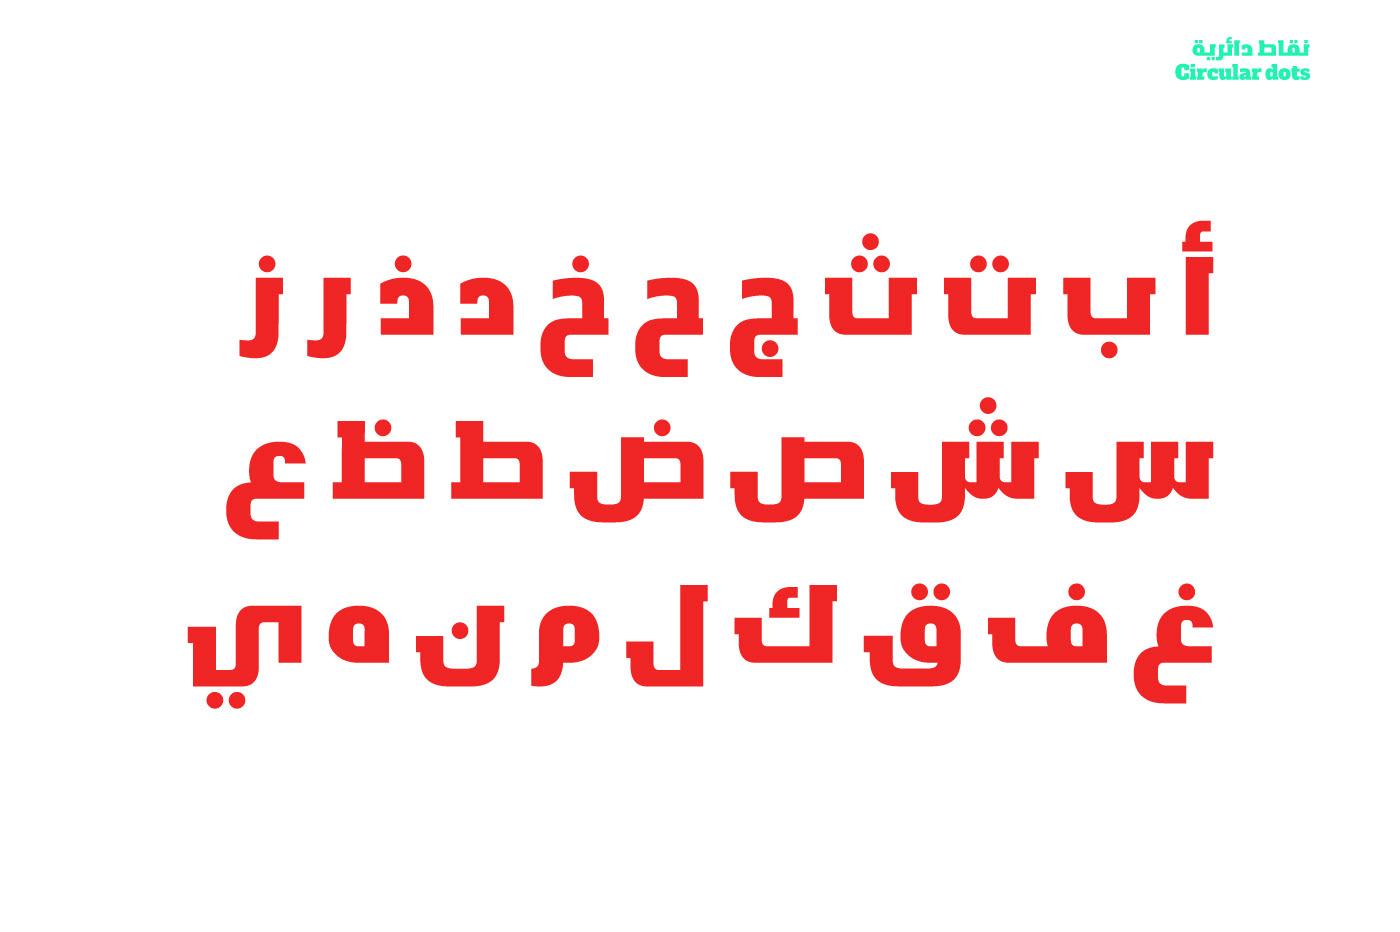 تحميل خط  تايبو الجديد - Download Typo Font